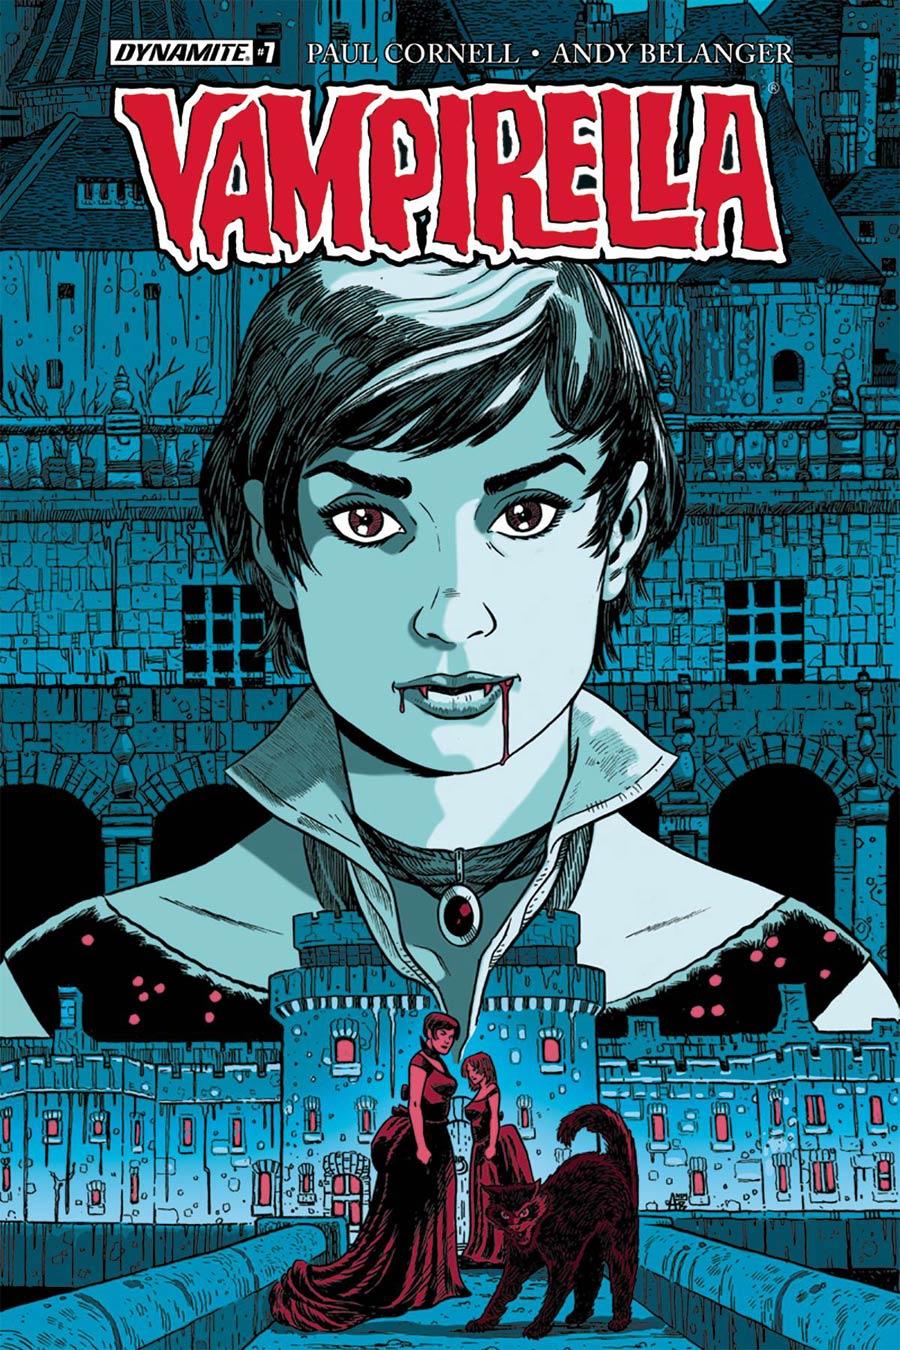 Vampirella Vol 7 #7 Cover B Variant Andy Belanger Cover